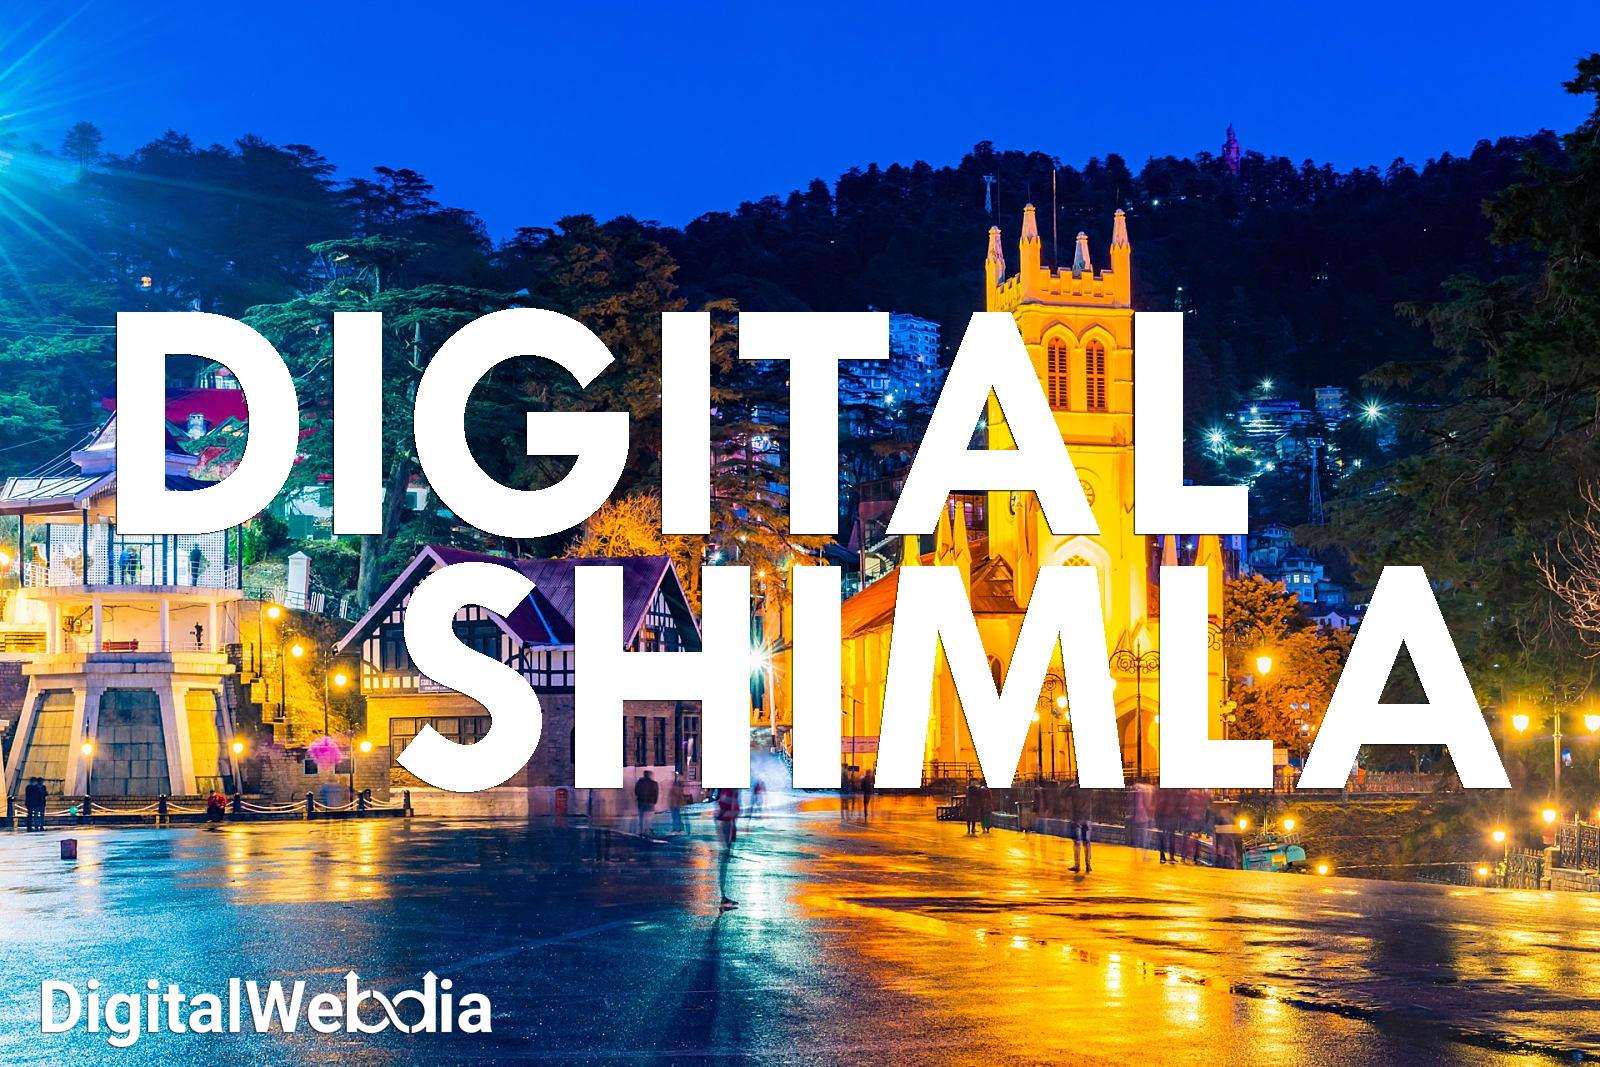 No.1 Digital Marketing Agency in Shimla (Himachal Pradesh)